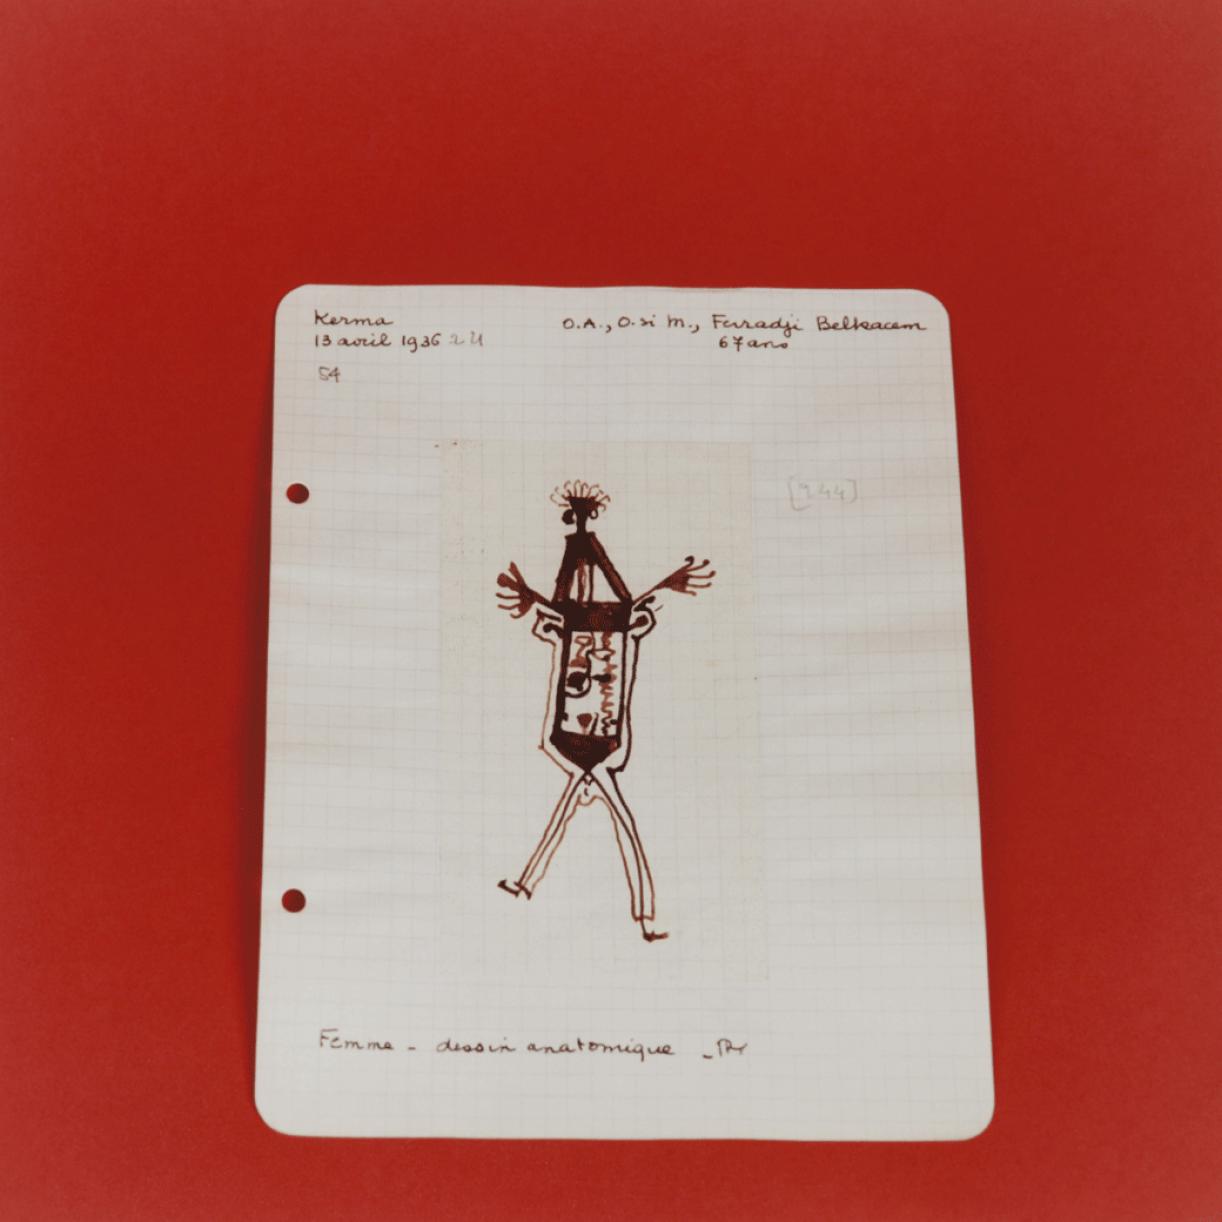 Untitled (Album de dessins indigènes series (album of North African drawings)), 2014-2015, chromogenic prints, 40 x 40 cm